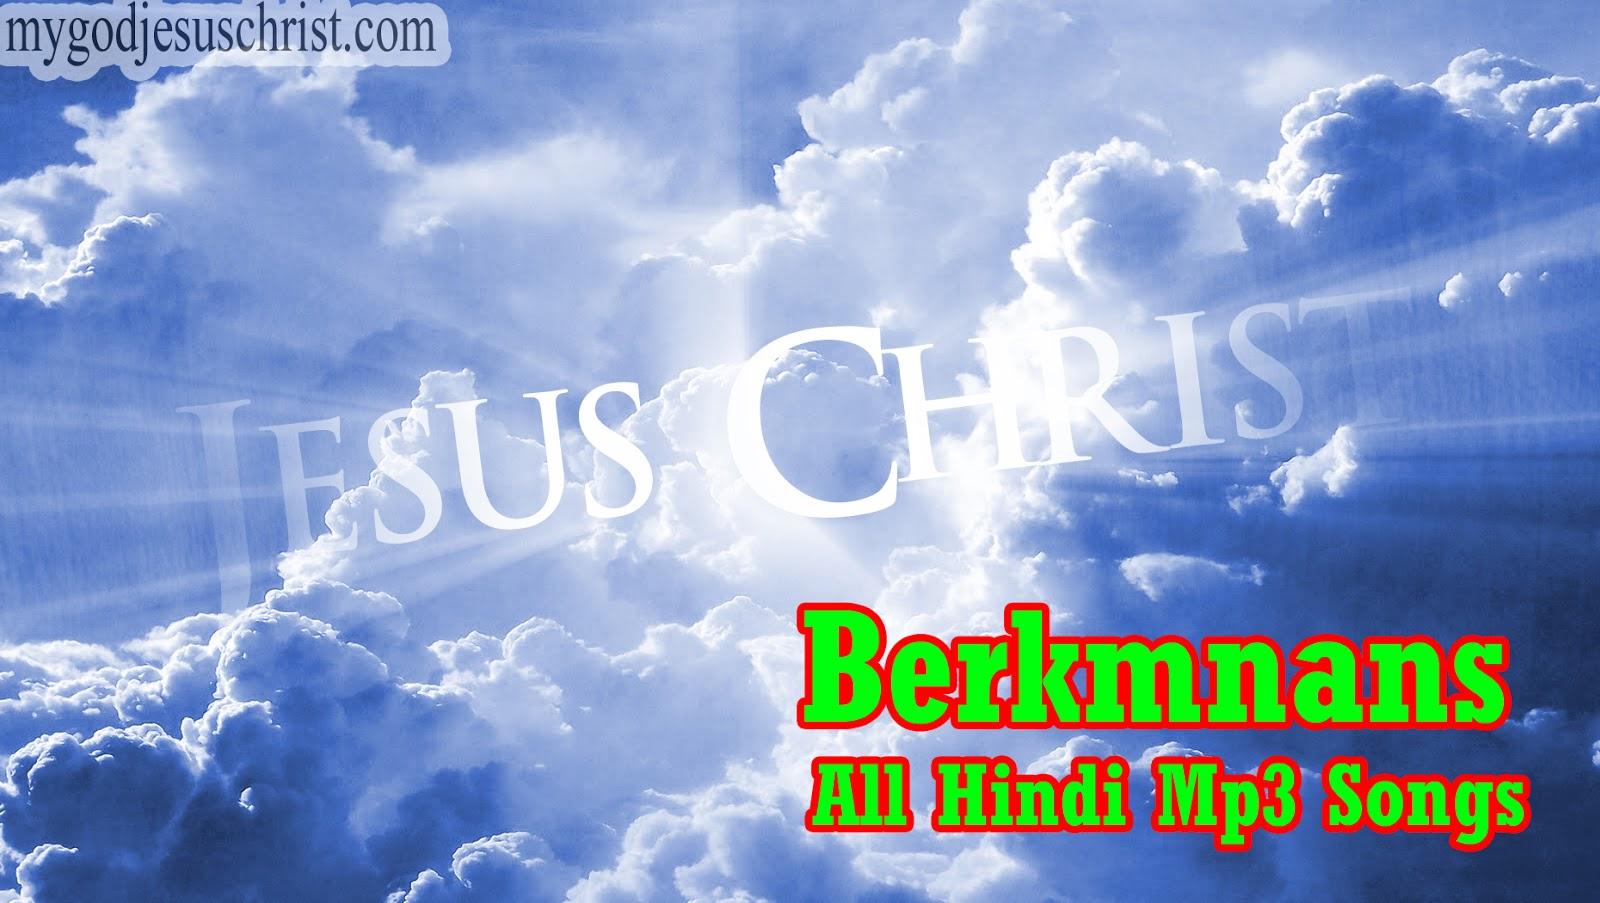 Jesus christ songs free download.